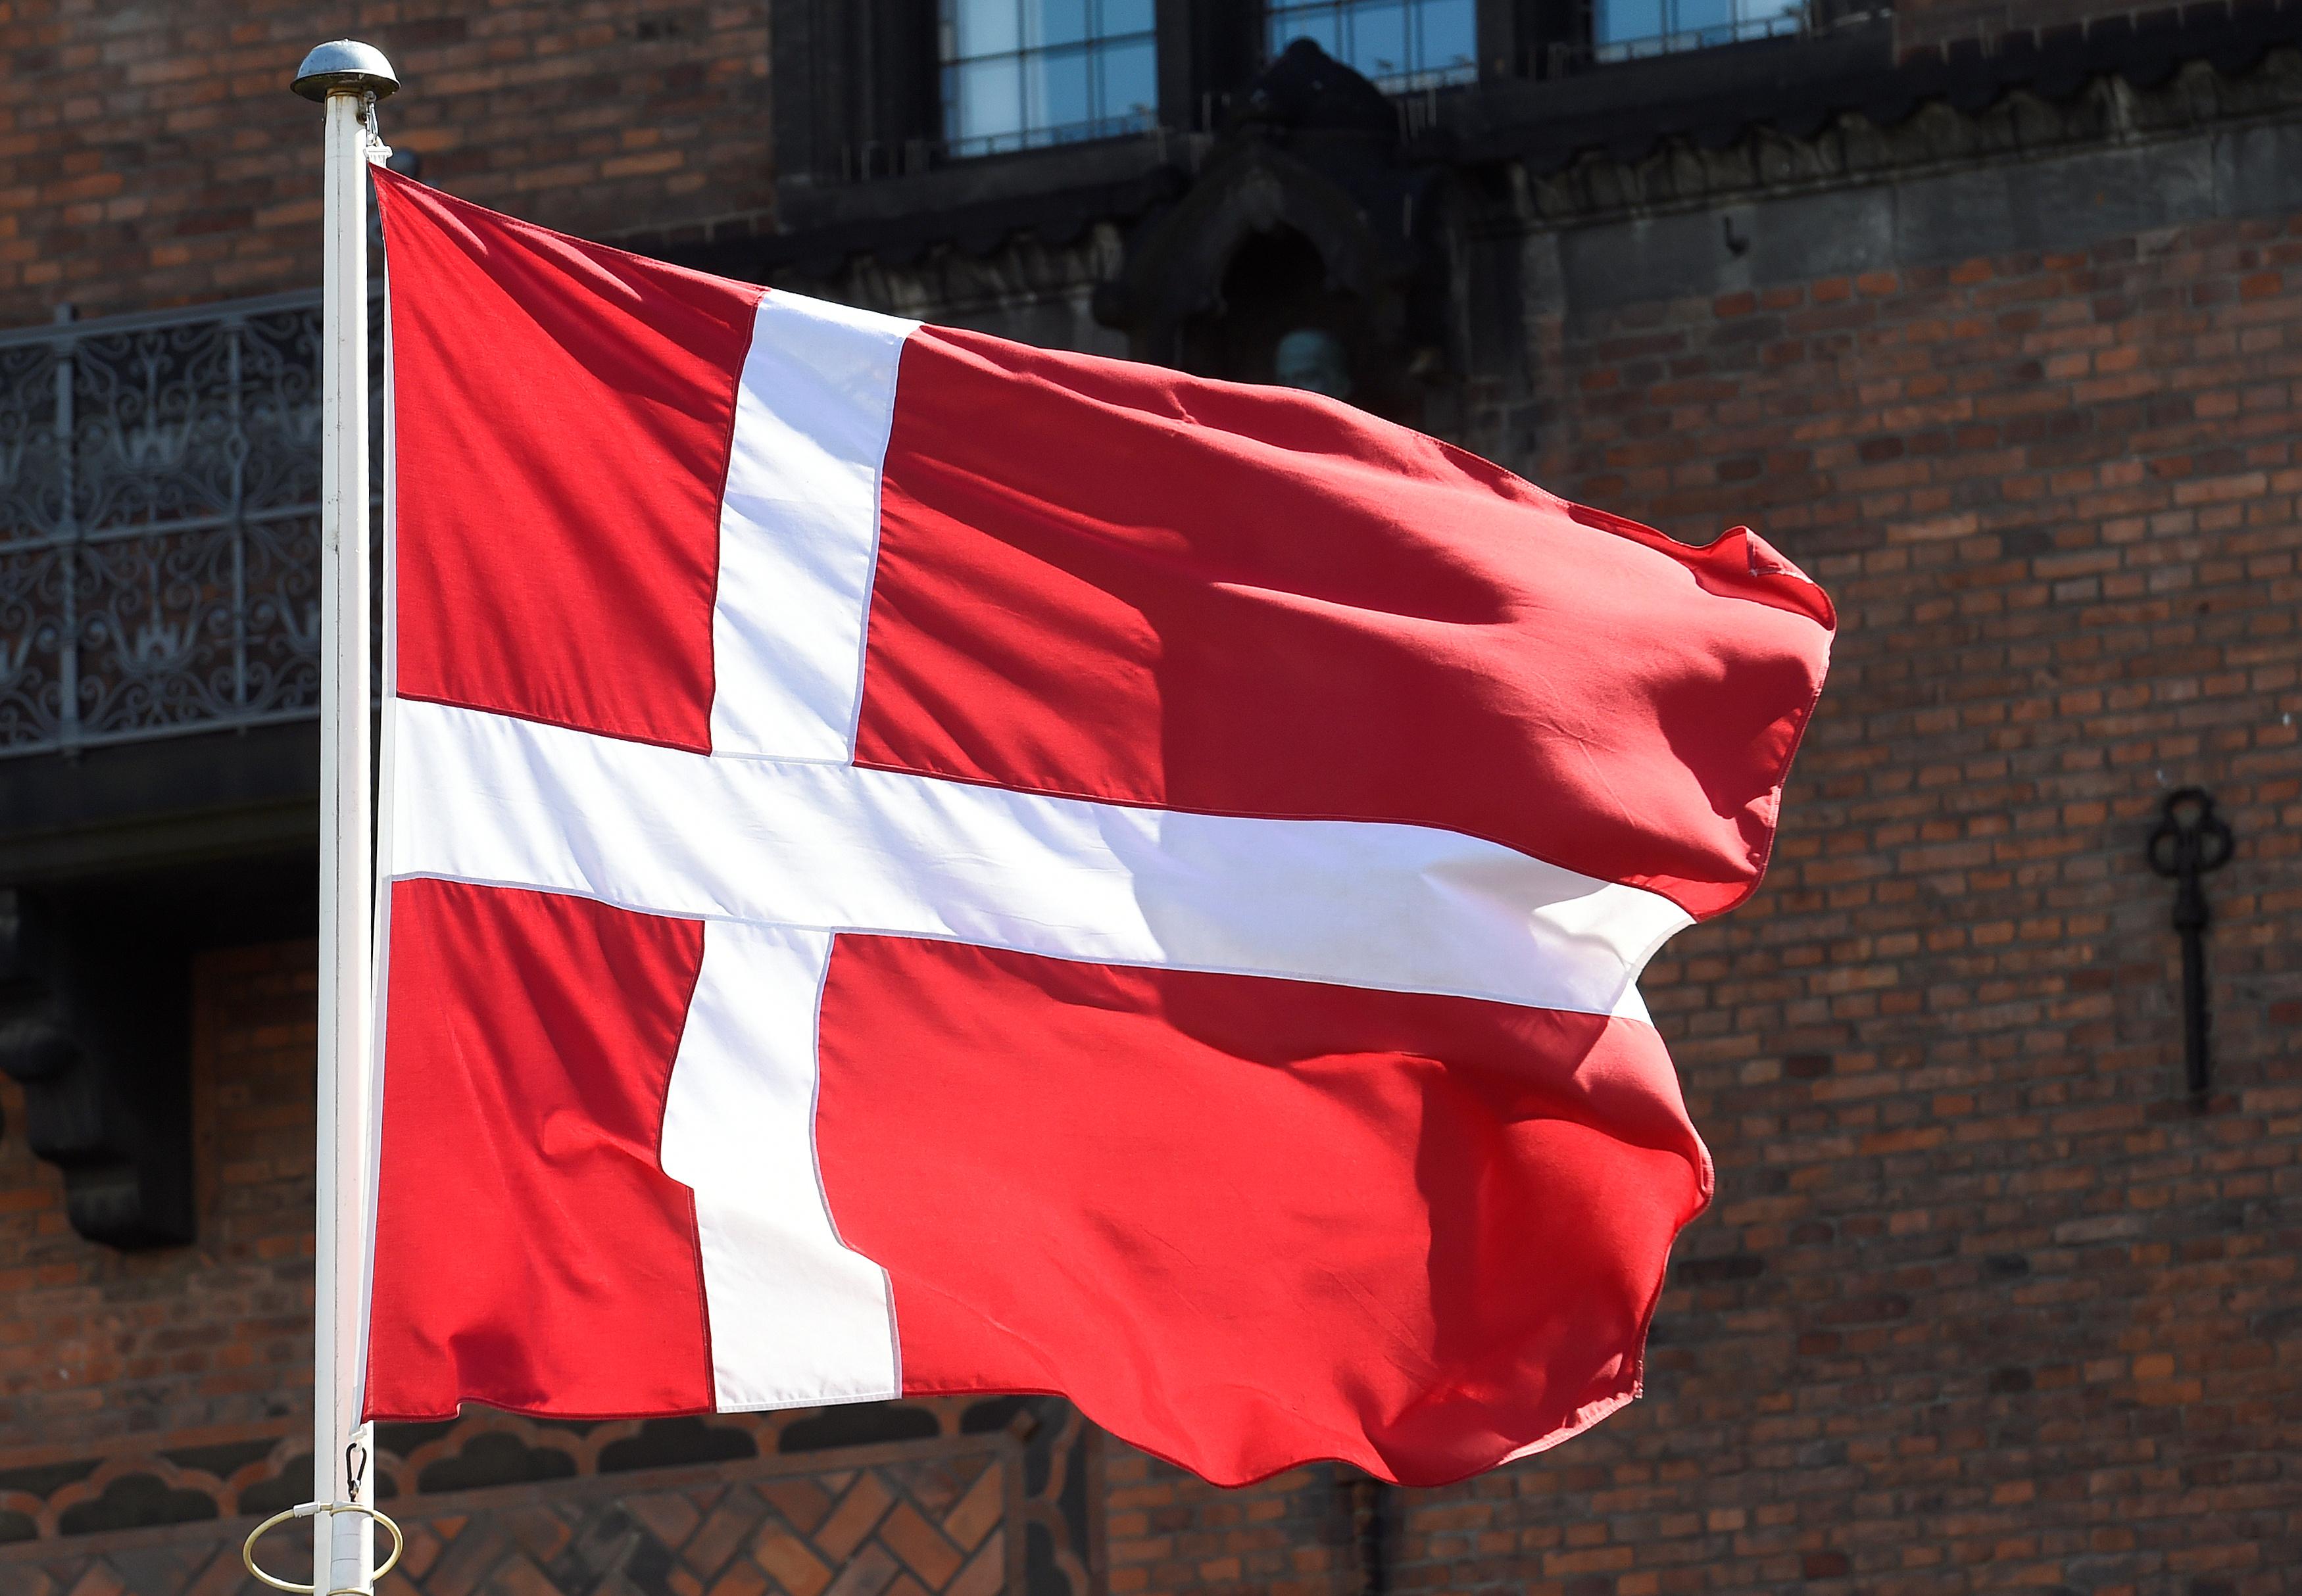 A Danish flag is pictured in Copenhagen, Denmark April 19, 2017.  REUTERS/Fabian Bimmer